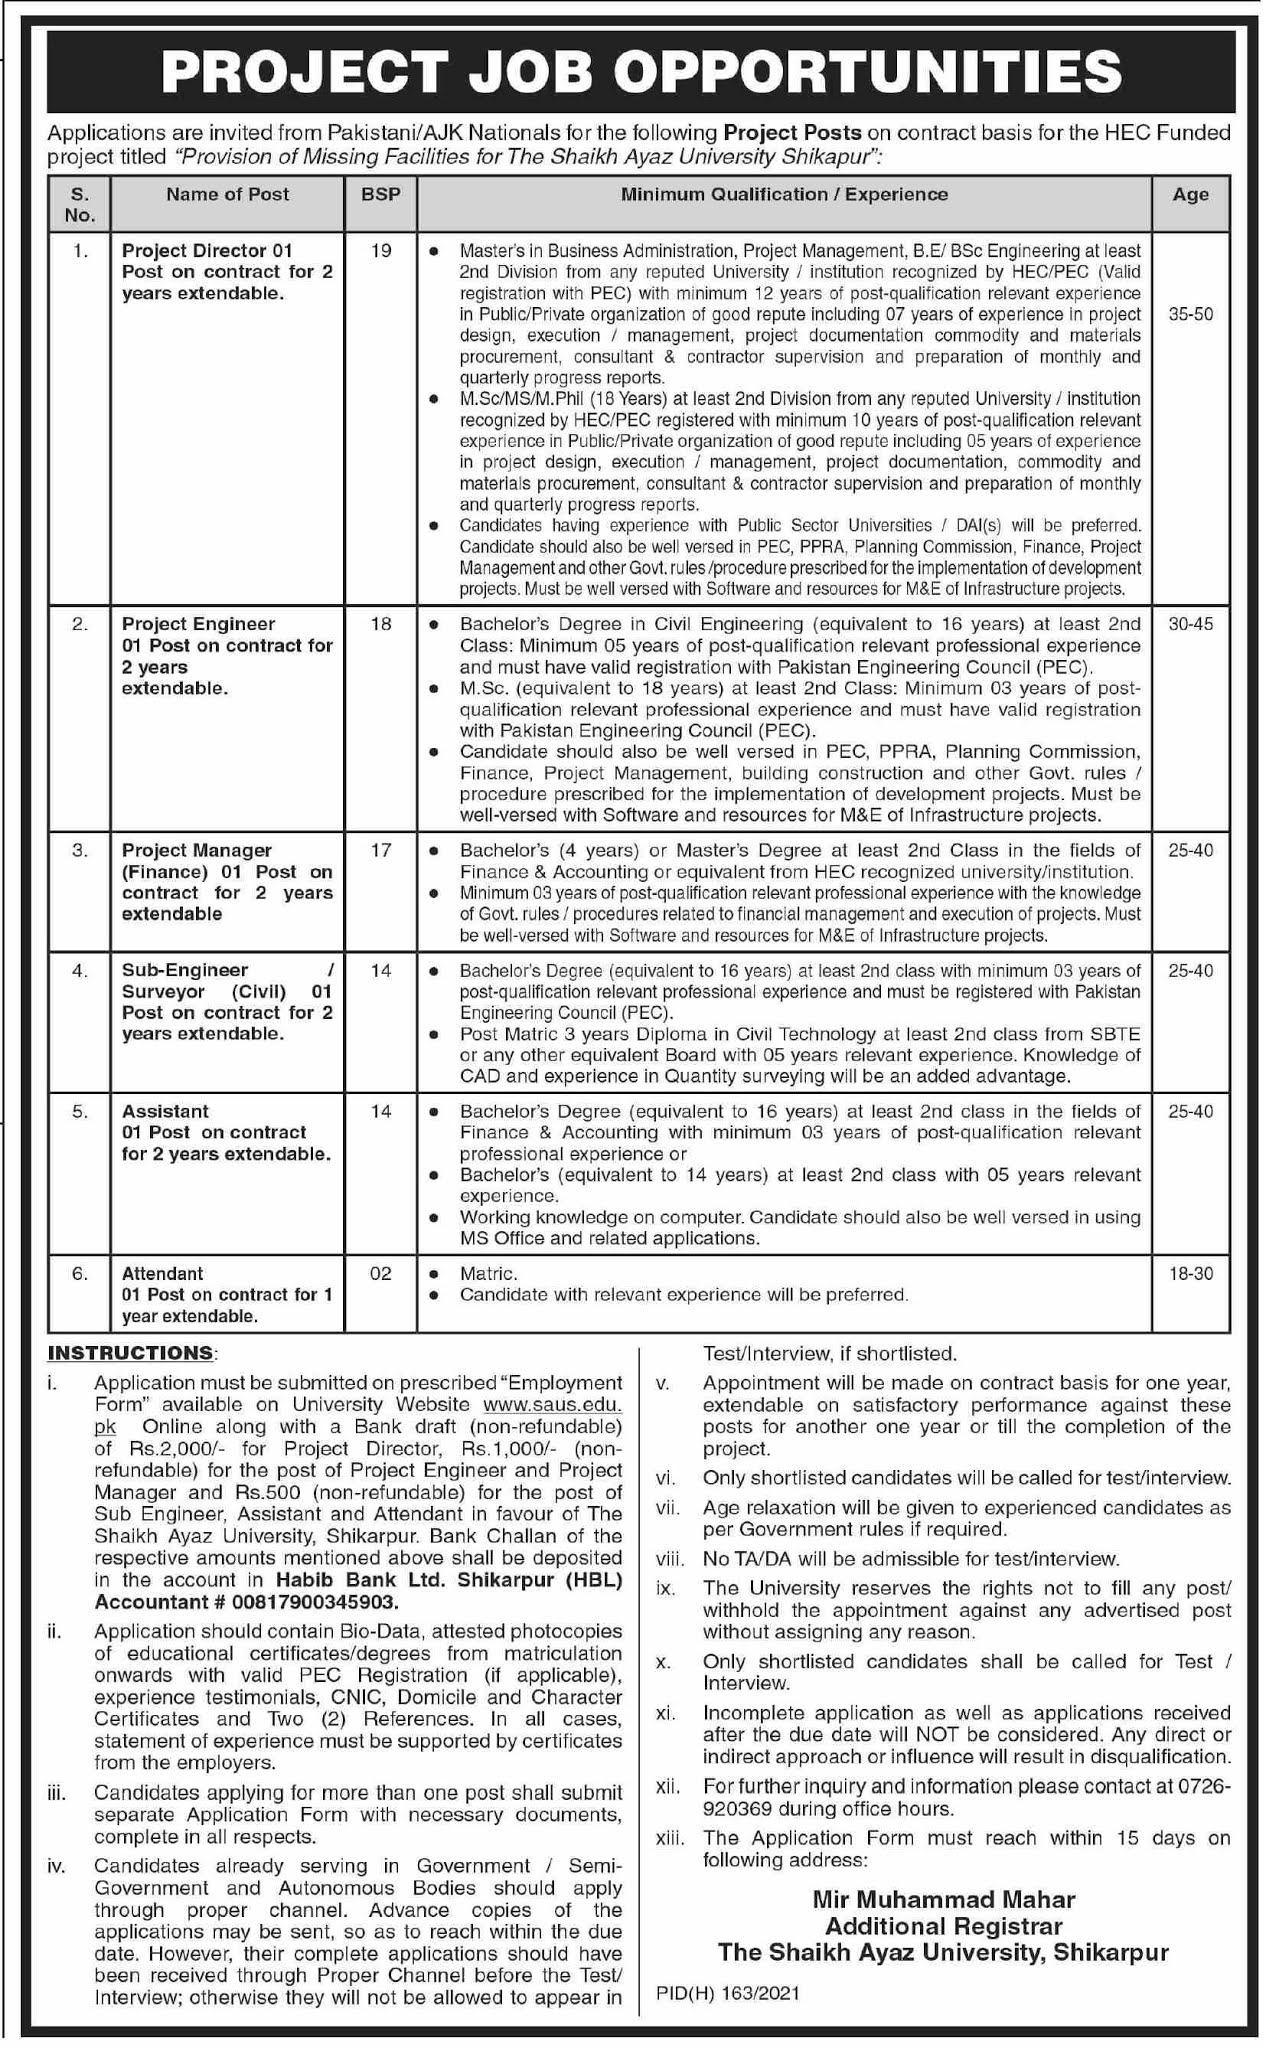 www.saus.edu.pk Jobs 2021 - Shaikh Ayaz University Jobs 2021 in Pakistan